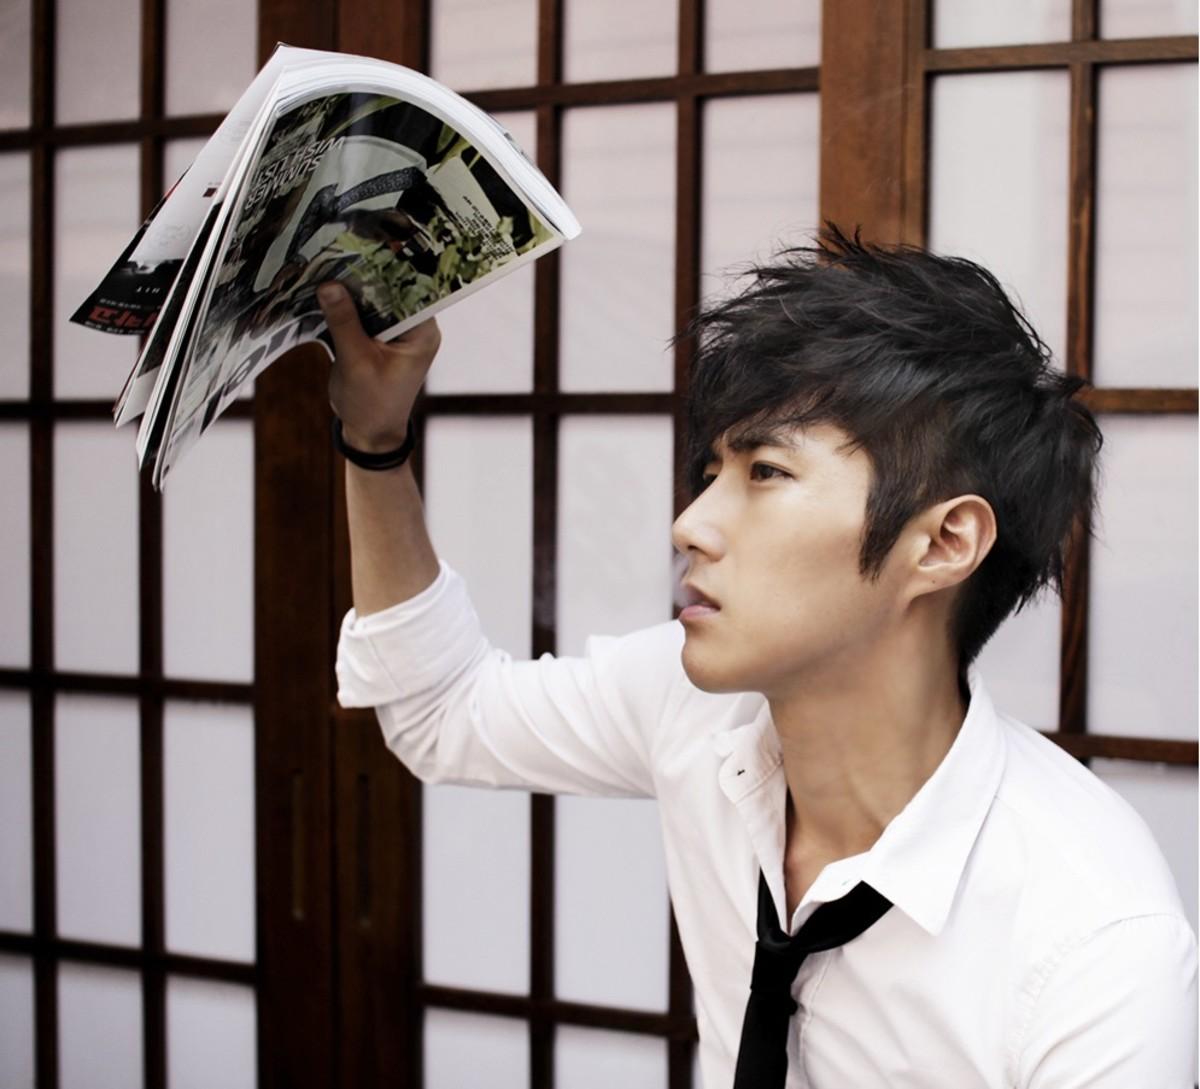 Awe Inspiring Latest Trendy Asian Amp Korean Hairstyles For Men 2015 Bellatory Short Hairstyles Gunalazisus